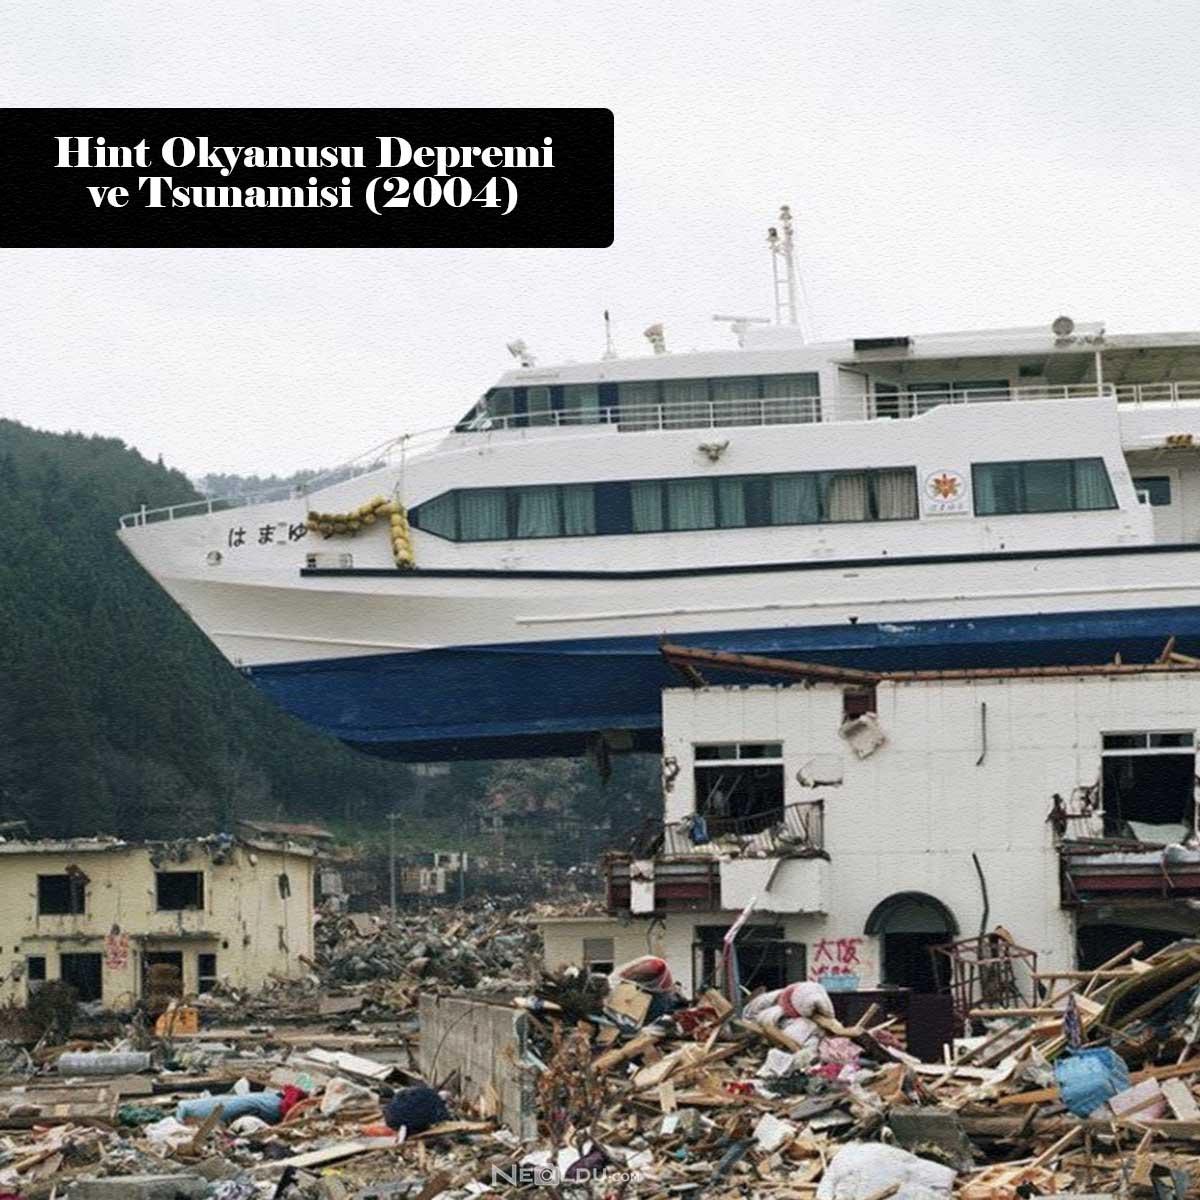 hint-okyanusu-depremi-ve-tsunamisi-(2004).jpg